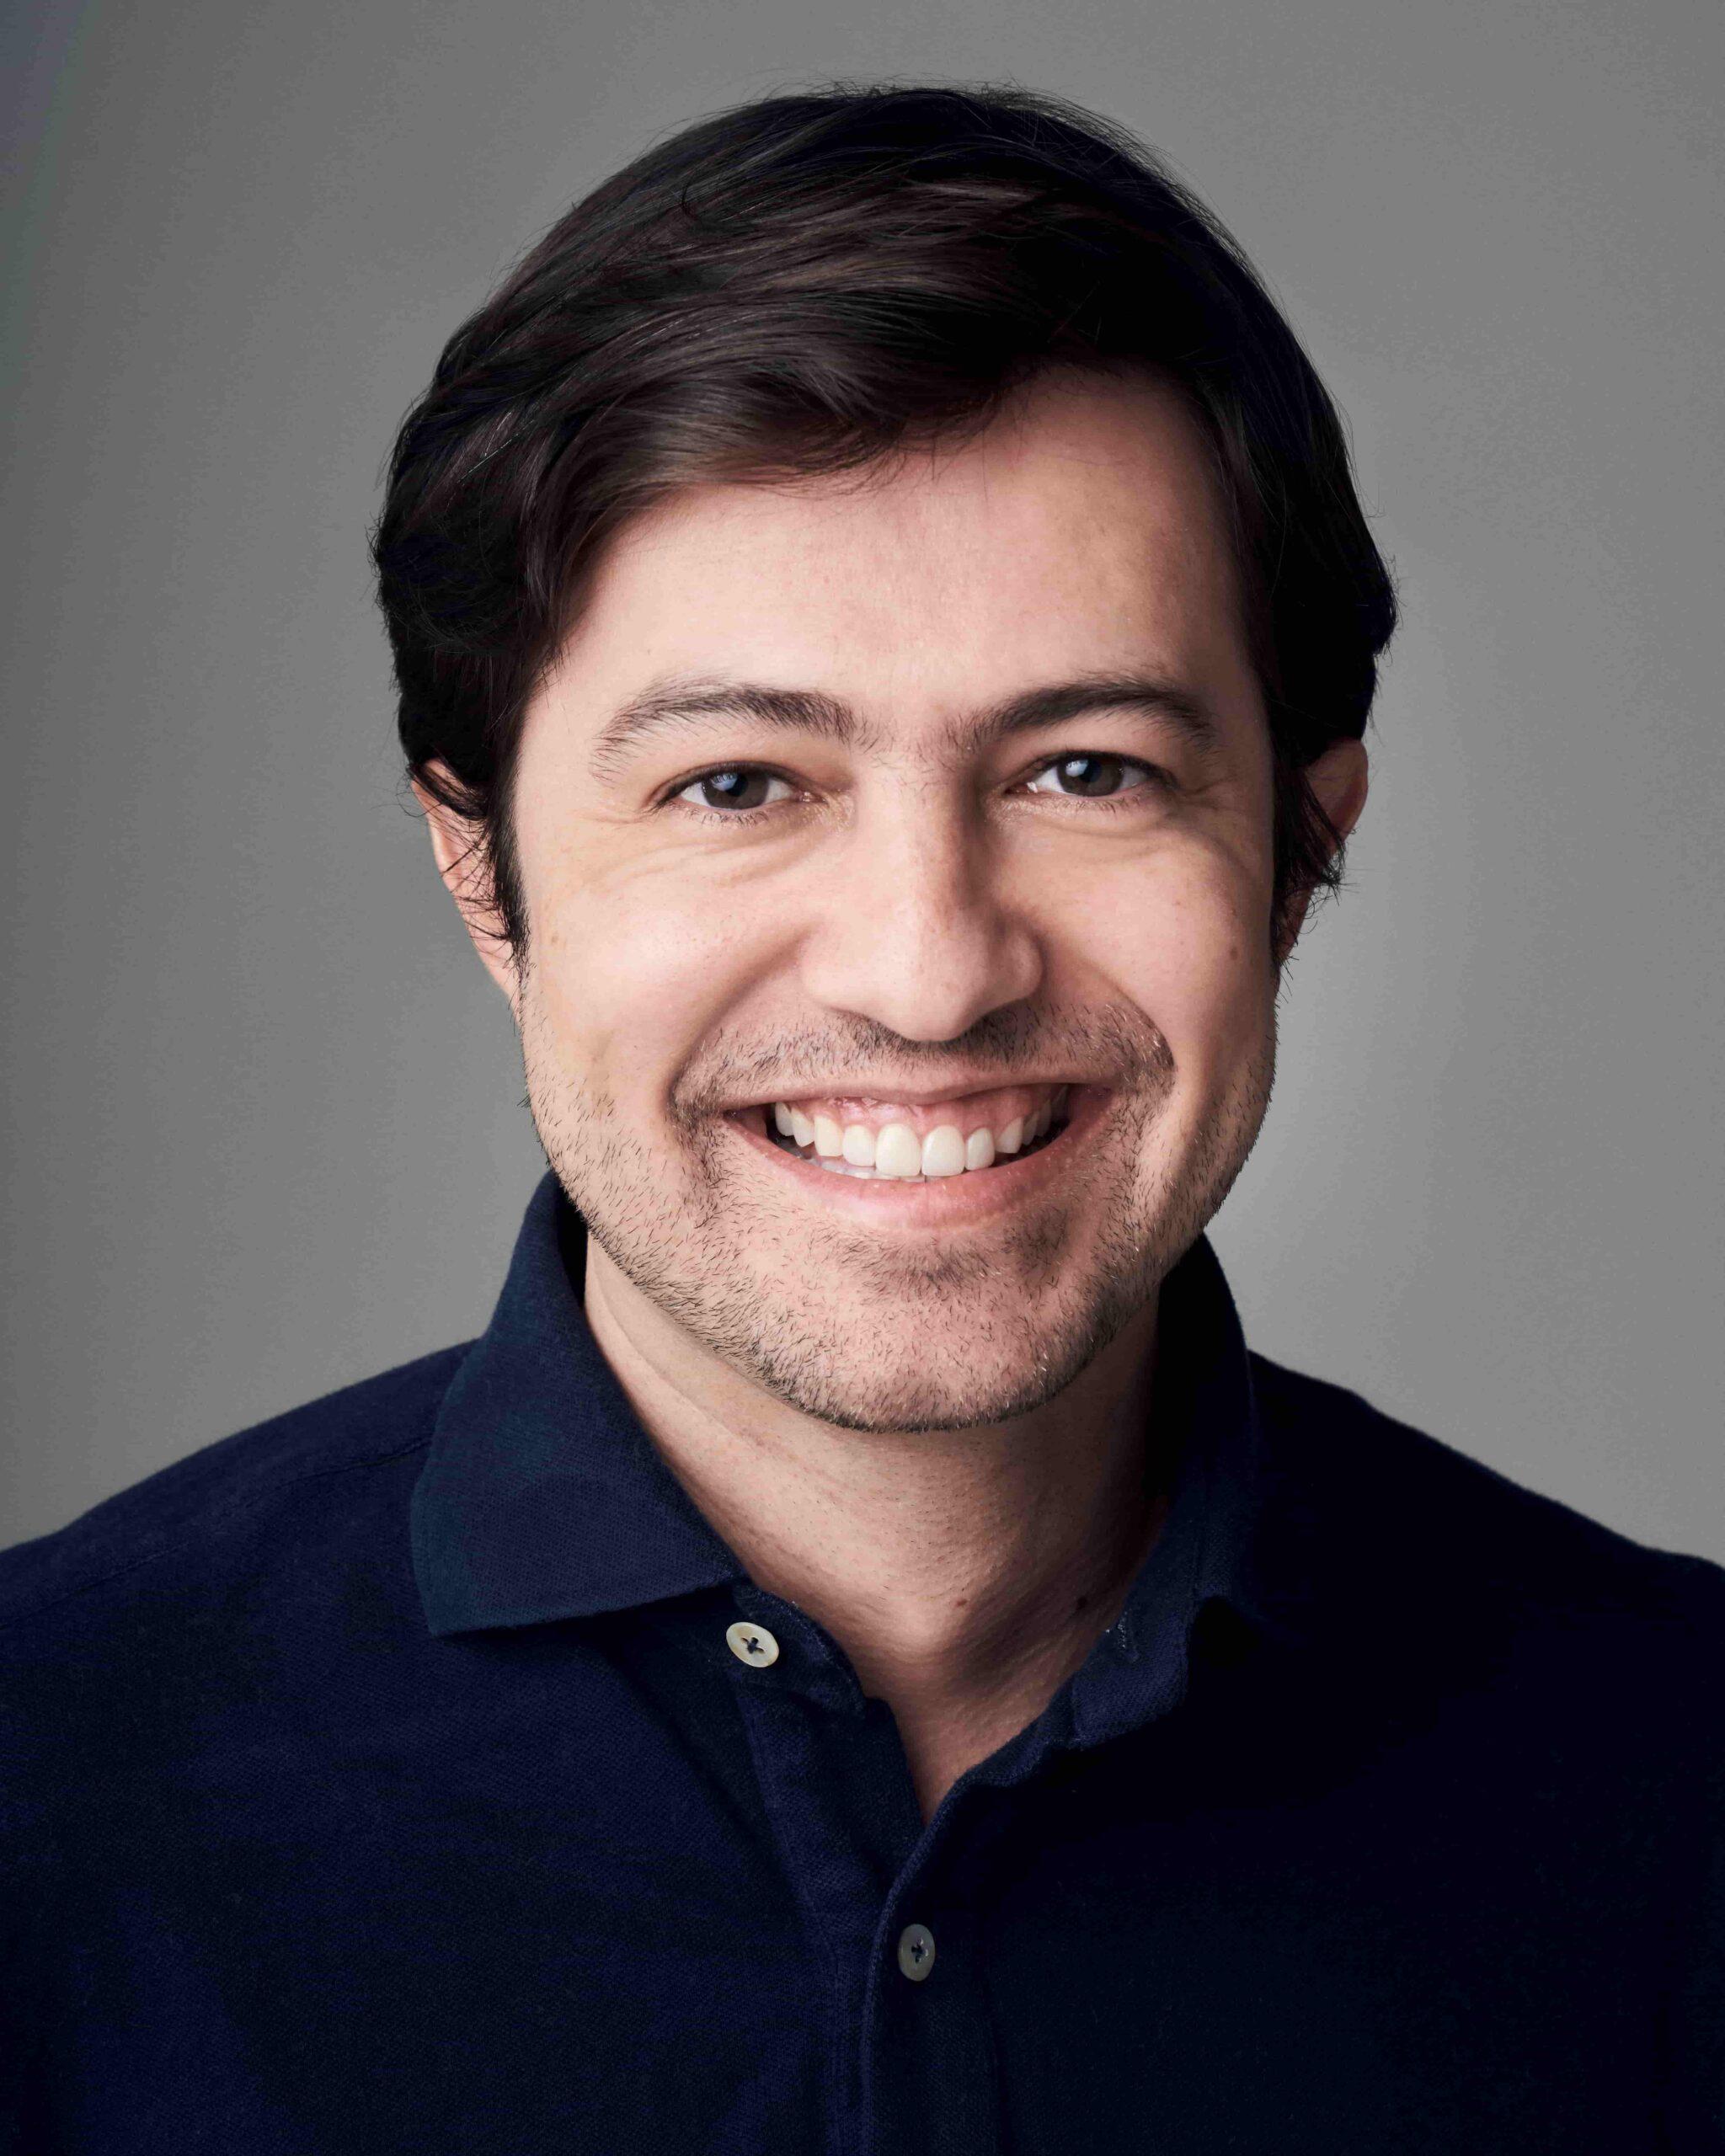 Paulo César Soares Itabaiana, Managing Director de Teads Brasil